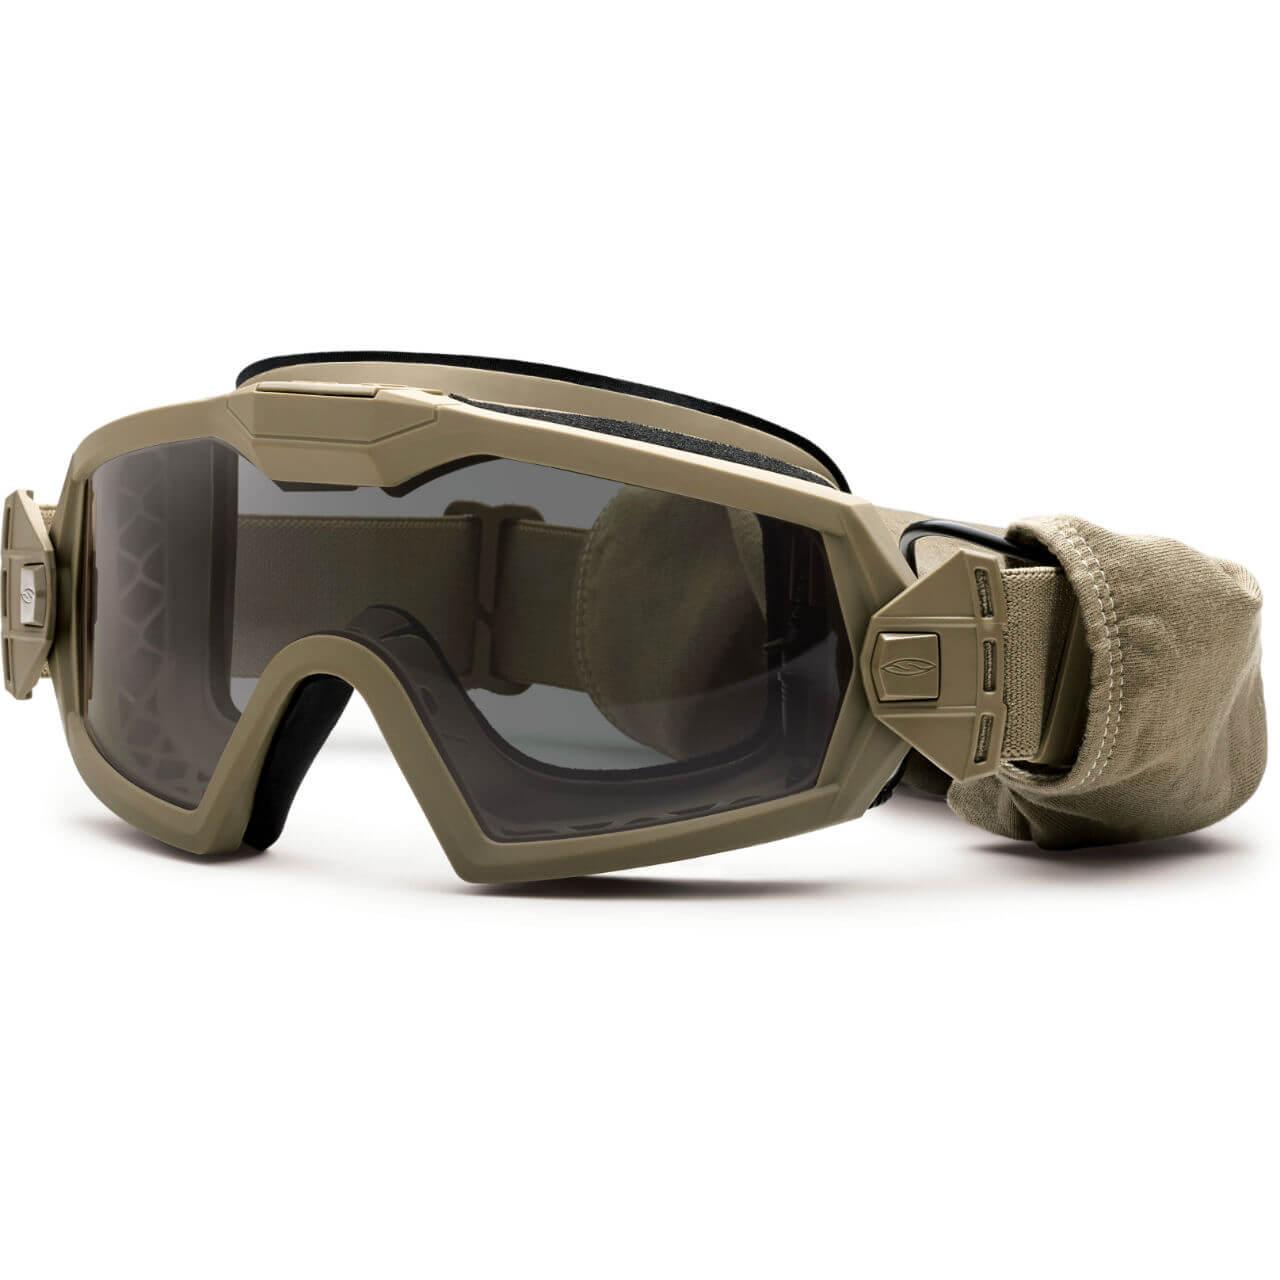 e31aae92c5942 Smith Optics Elite - Outside The Wire (OTW) Turbo Fan Goggles Field Kit (